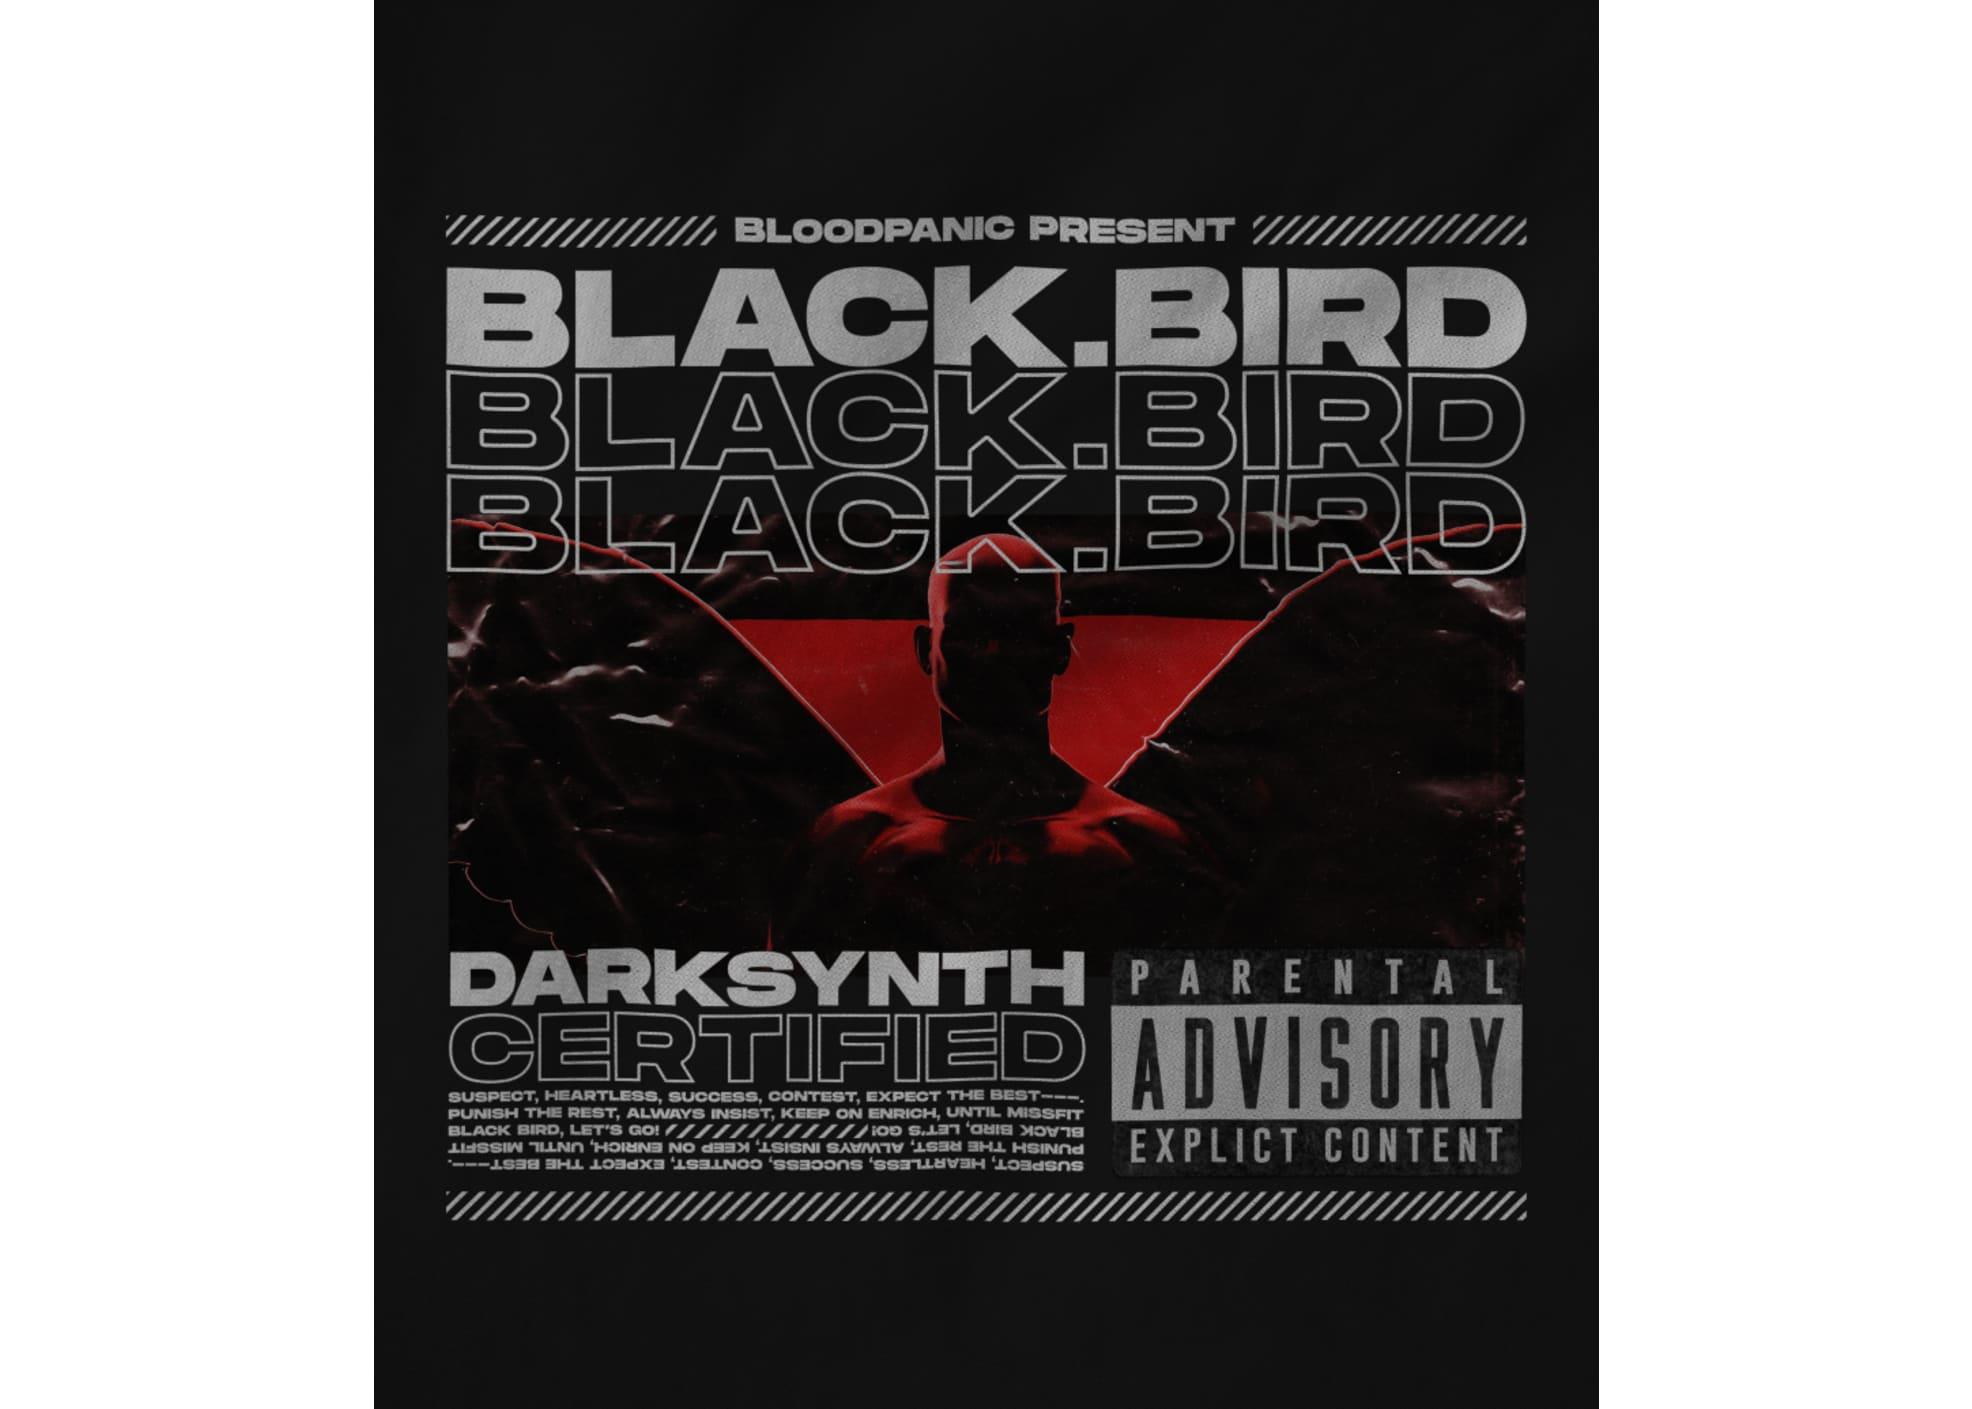 Bloodpanic black bird heavy   black 1622842657